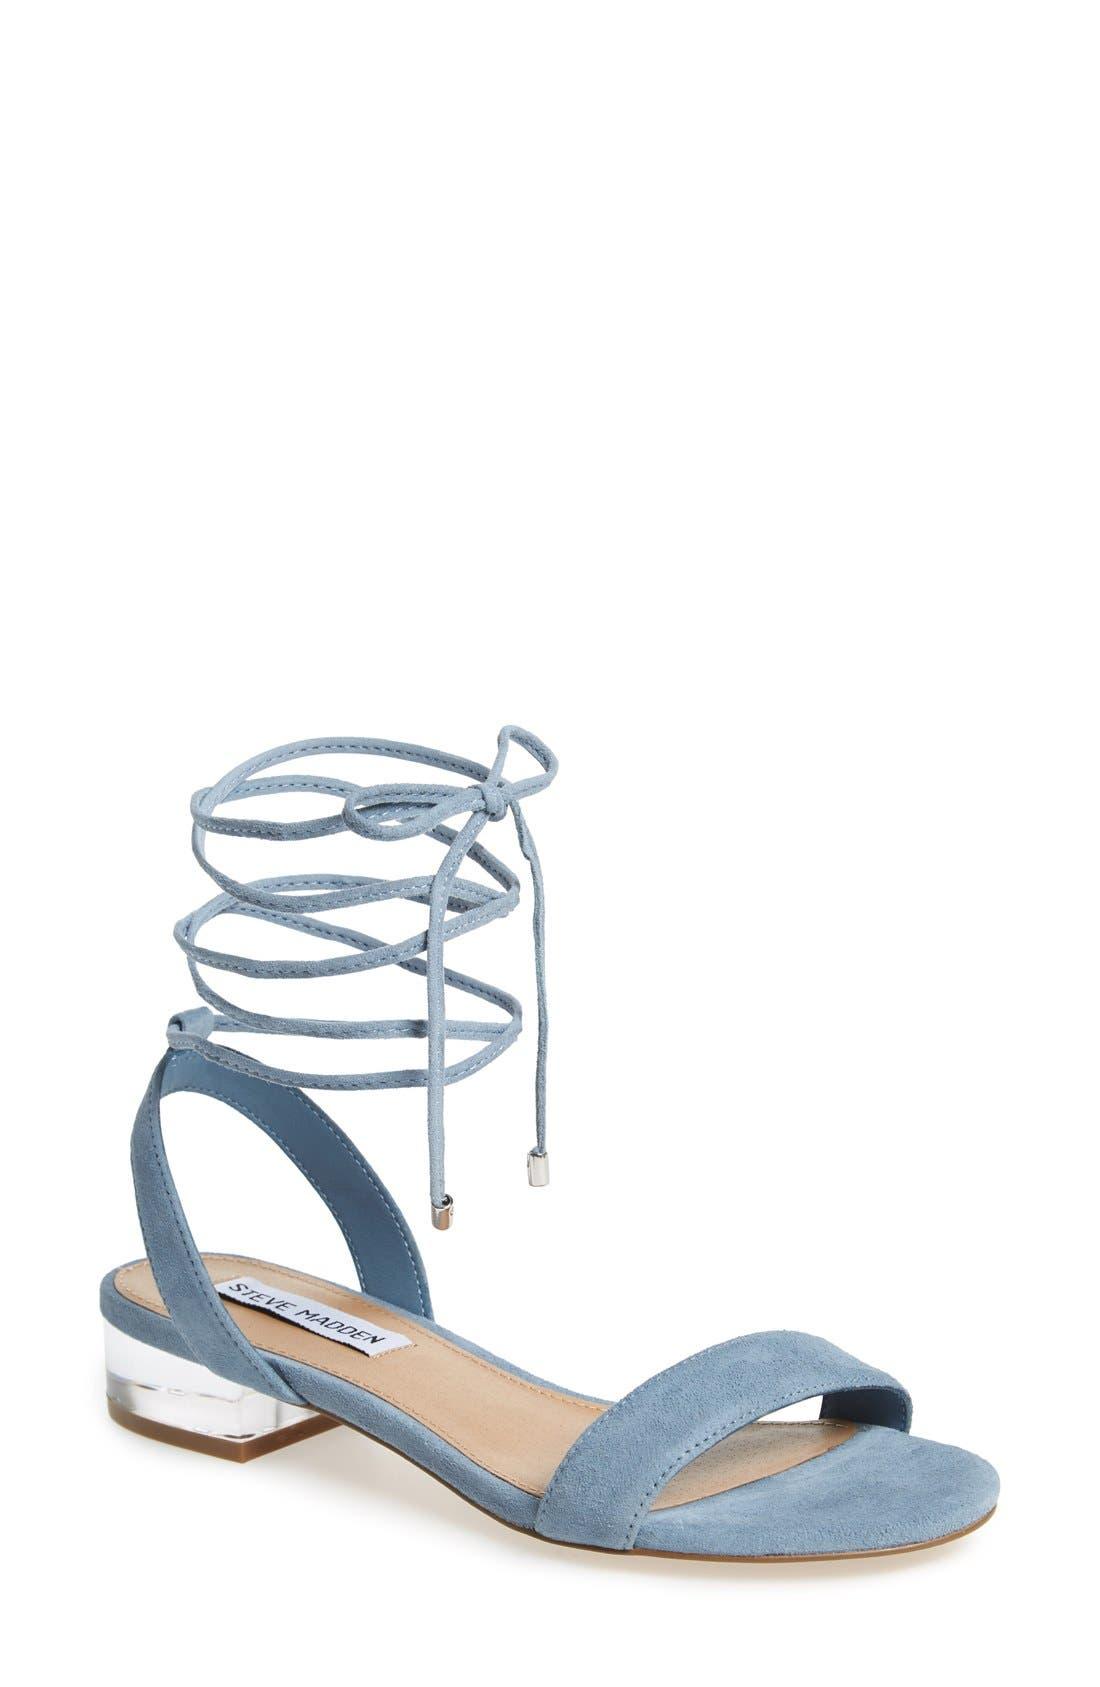 Steve Madden 'Carolyn' Lace-Up Sandal (Women)